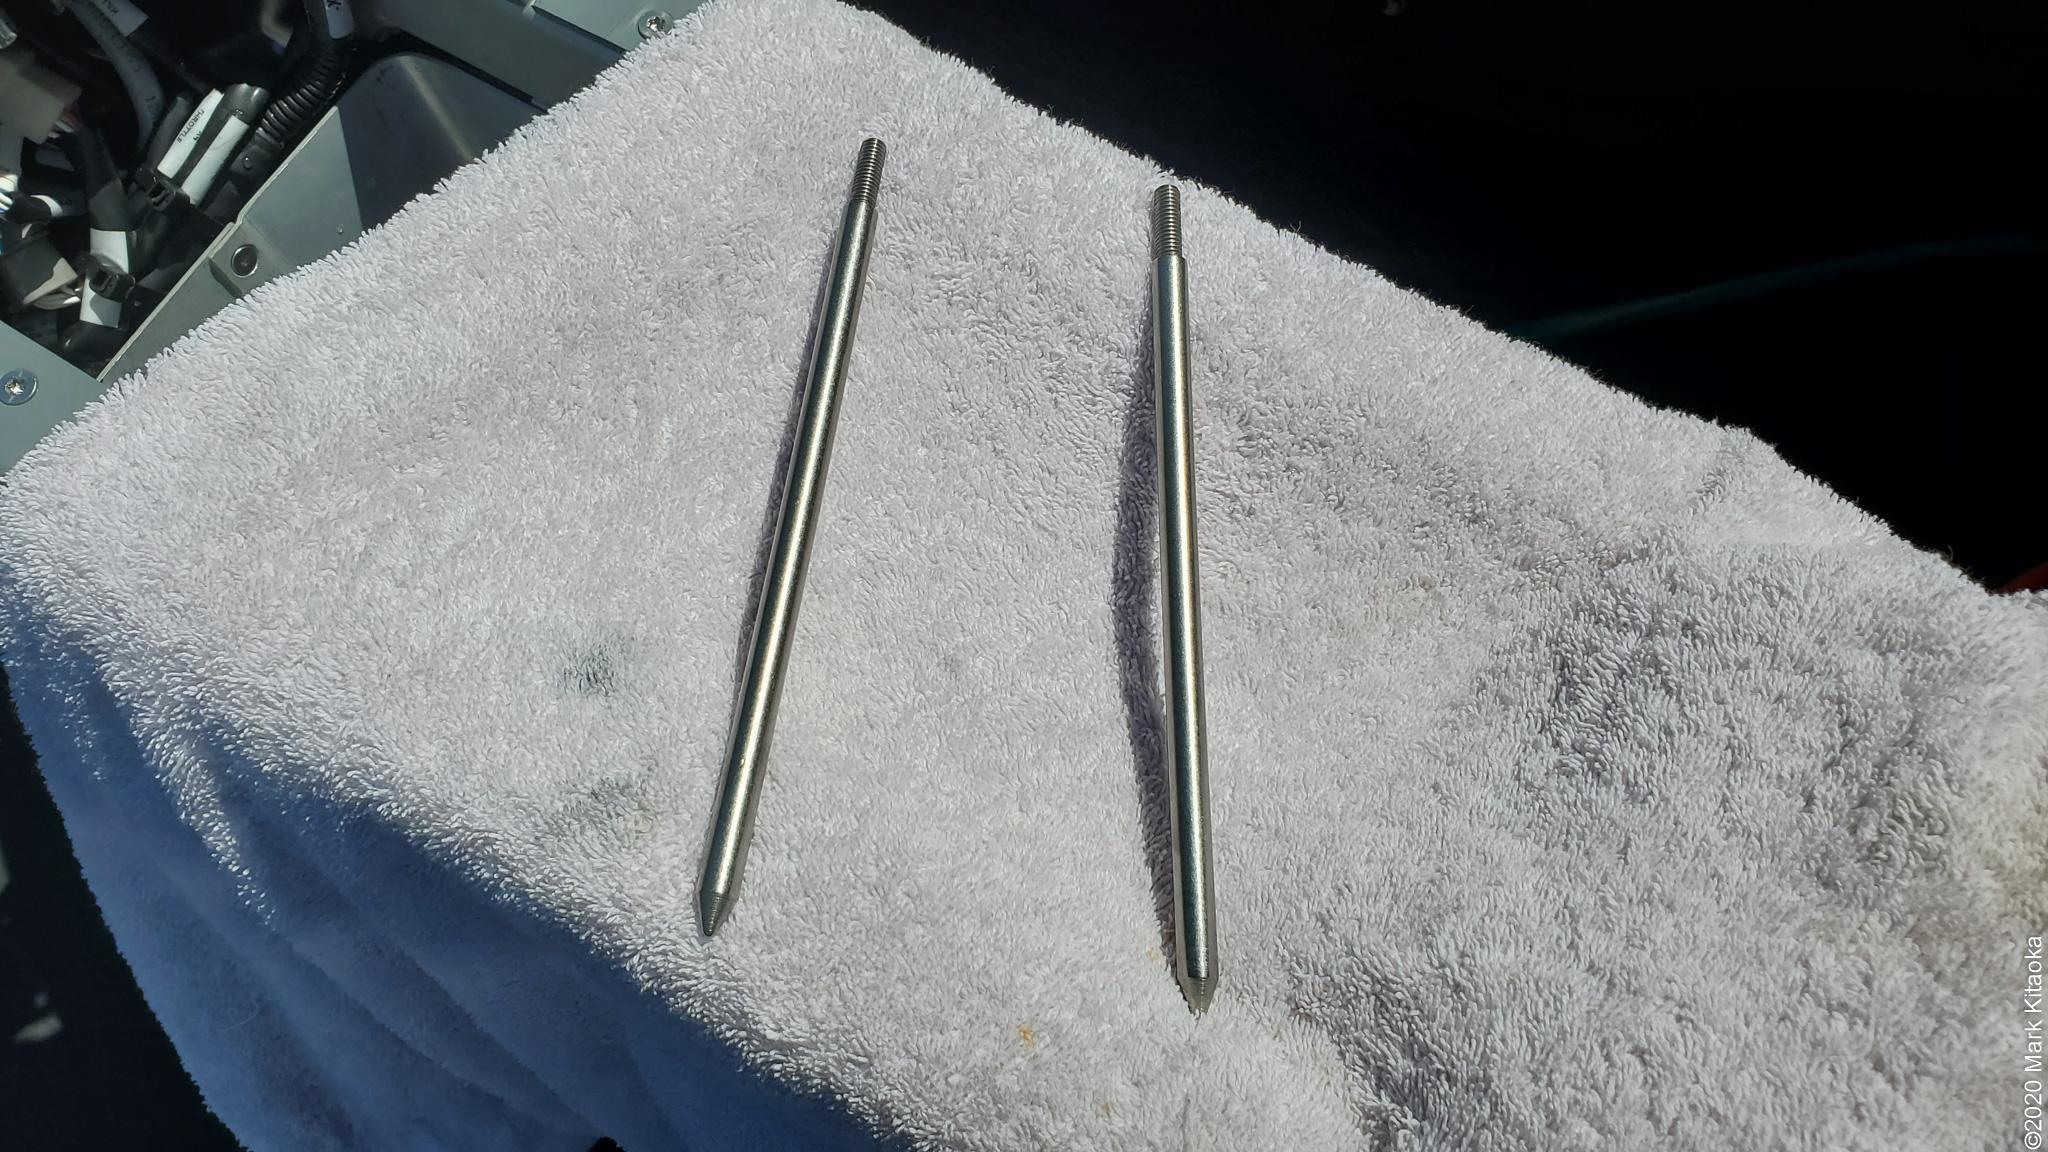 Kalk battery alignment rods